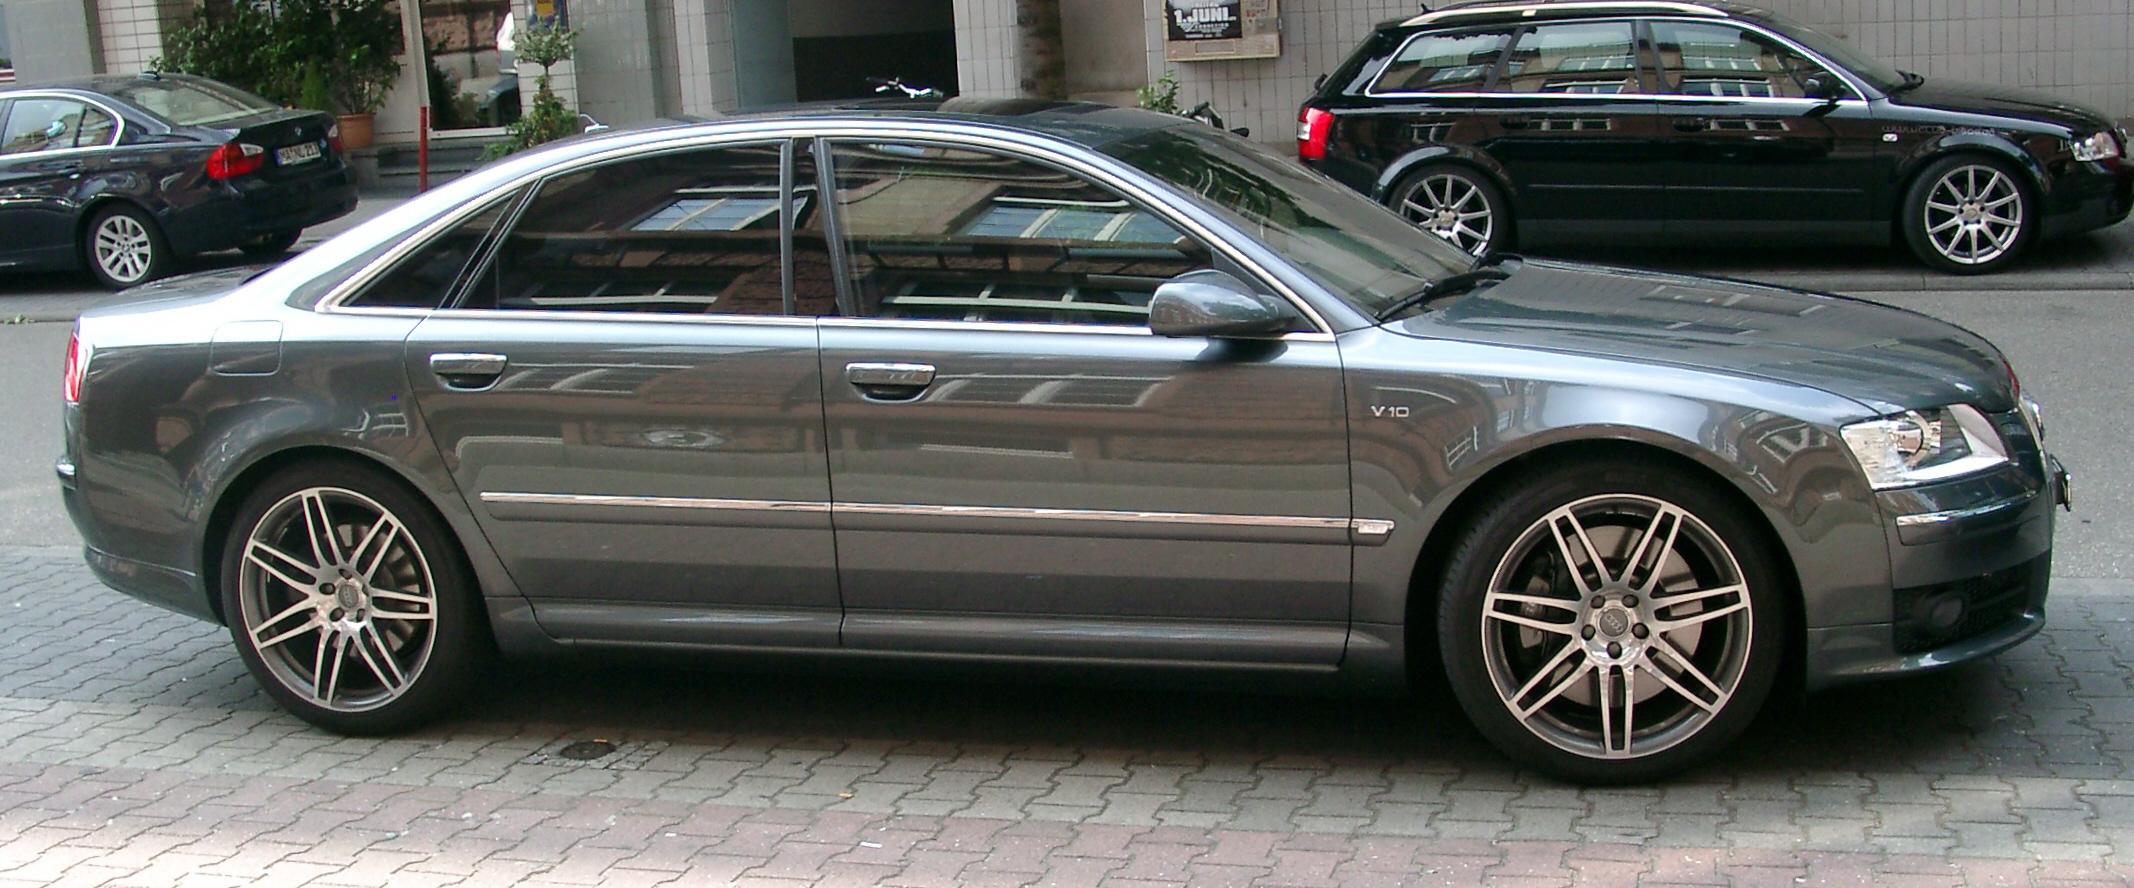 File Audi S8 Side 20070523 Jpg Wikimedia Commons